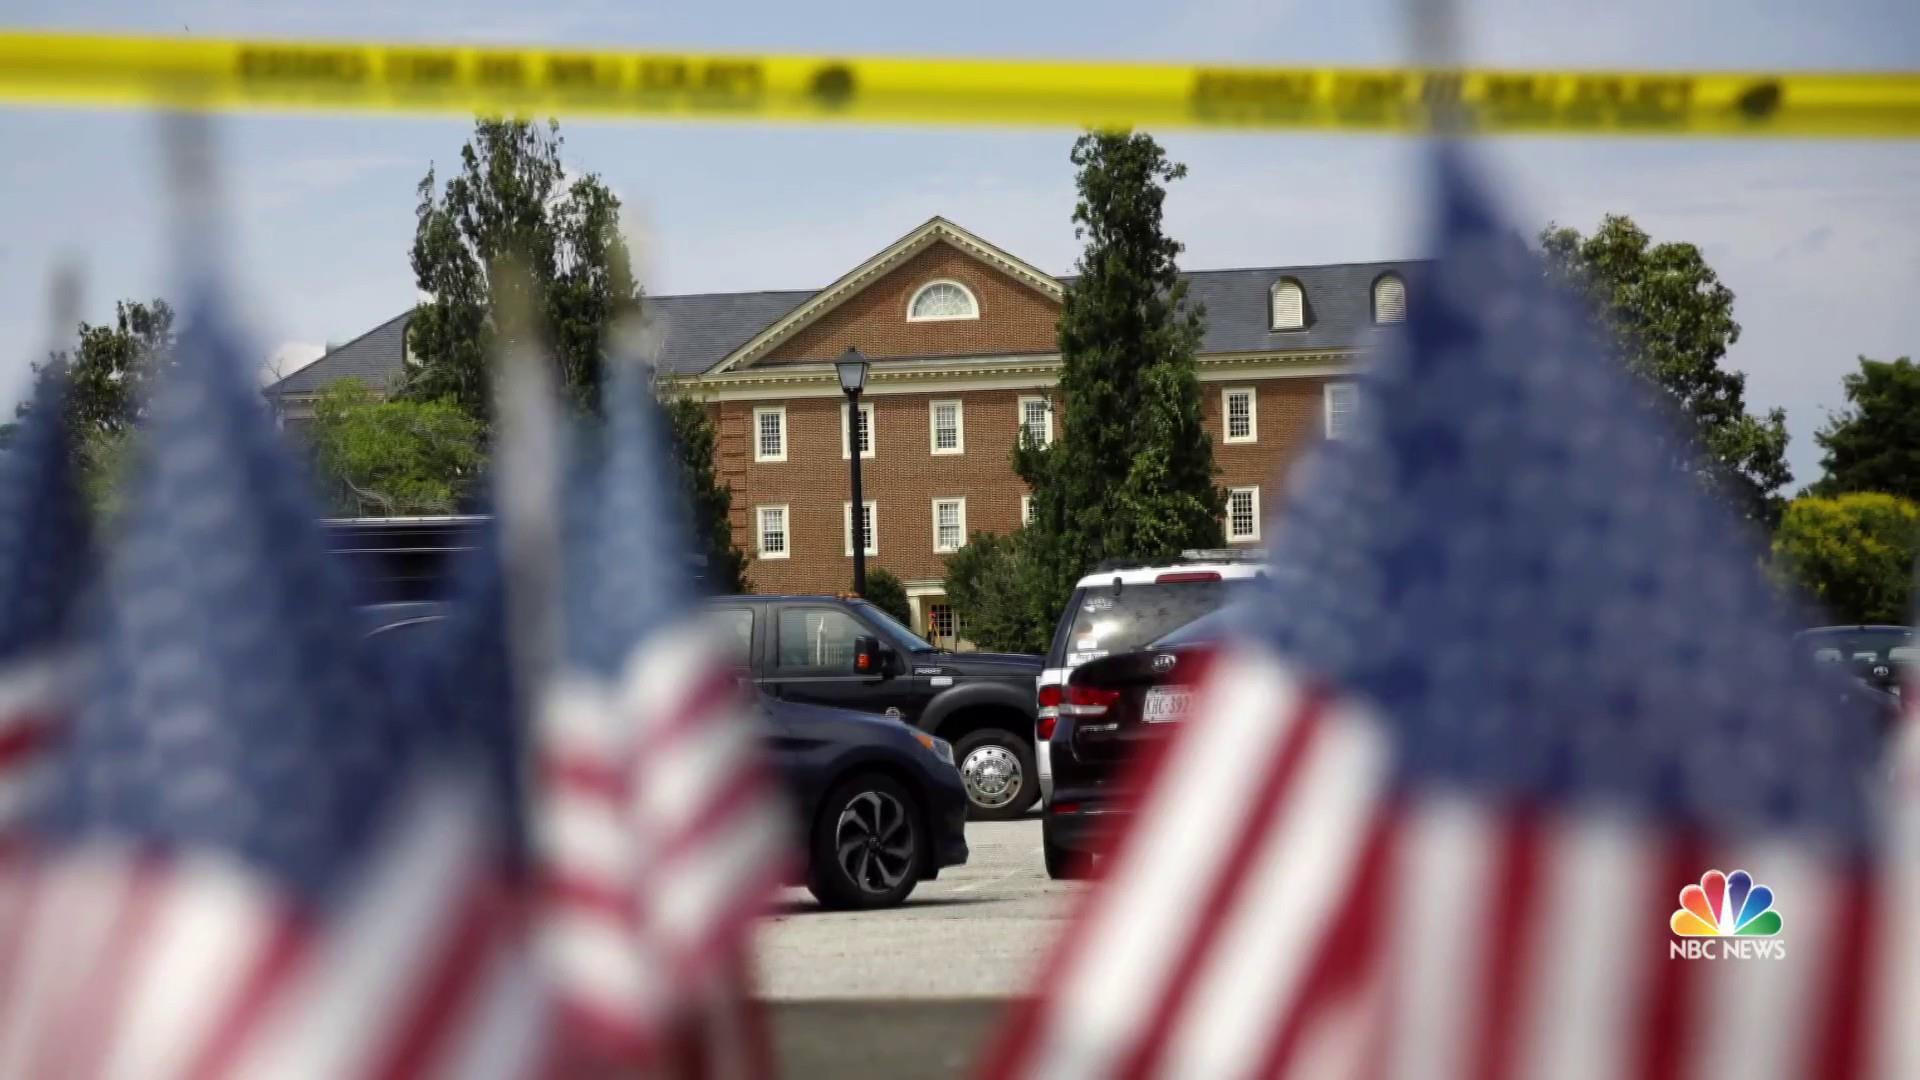 12 killed in Virginia Beach shooting; suspect, city engineer DeWayne Craddock, is dead